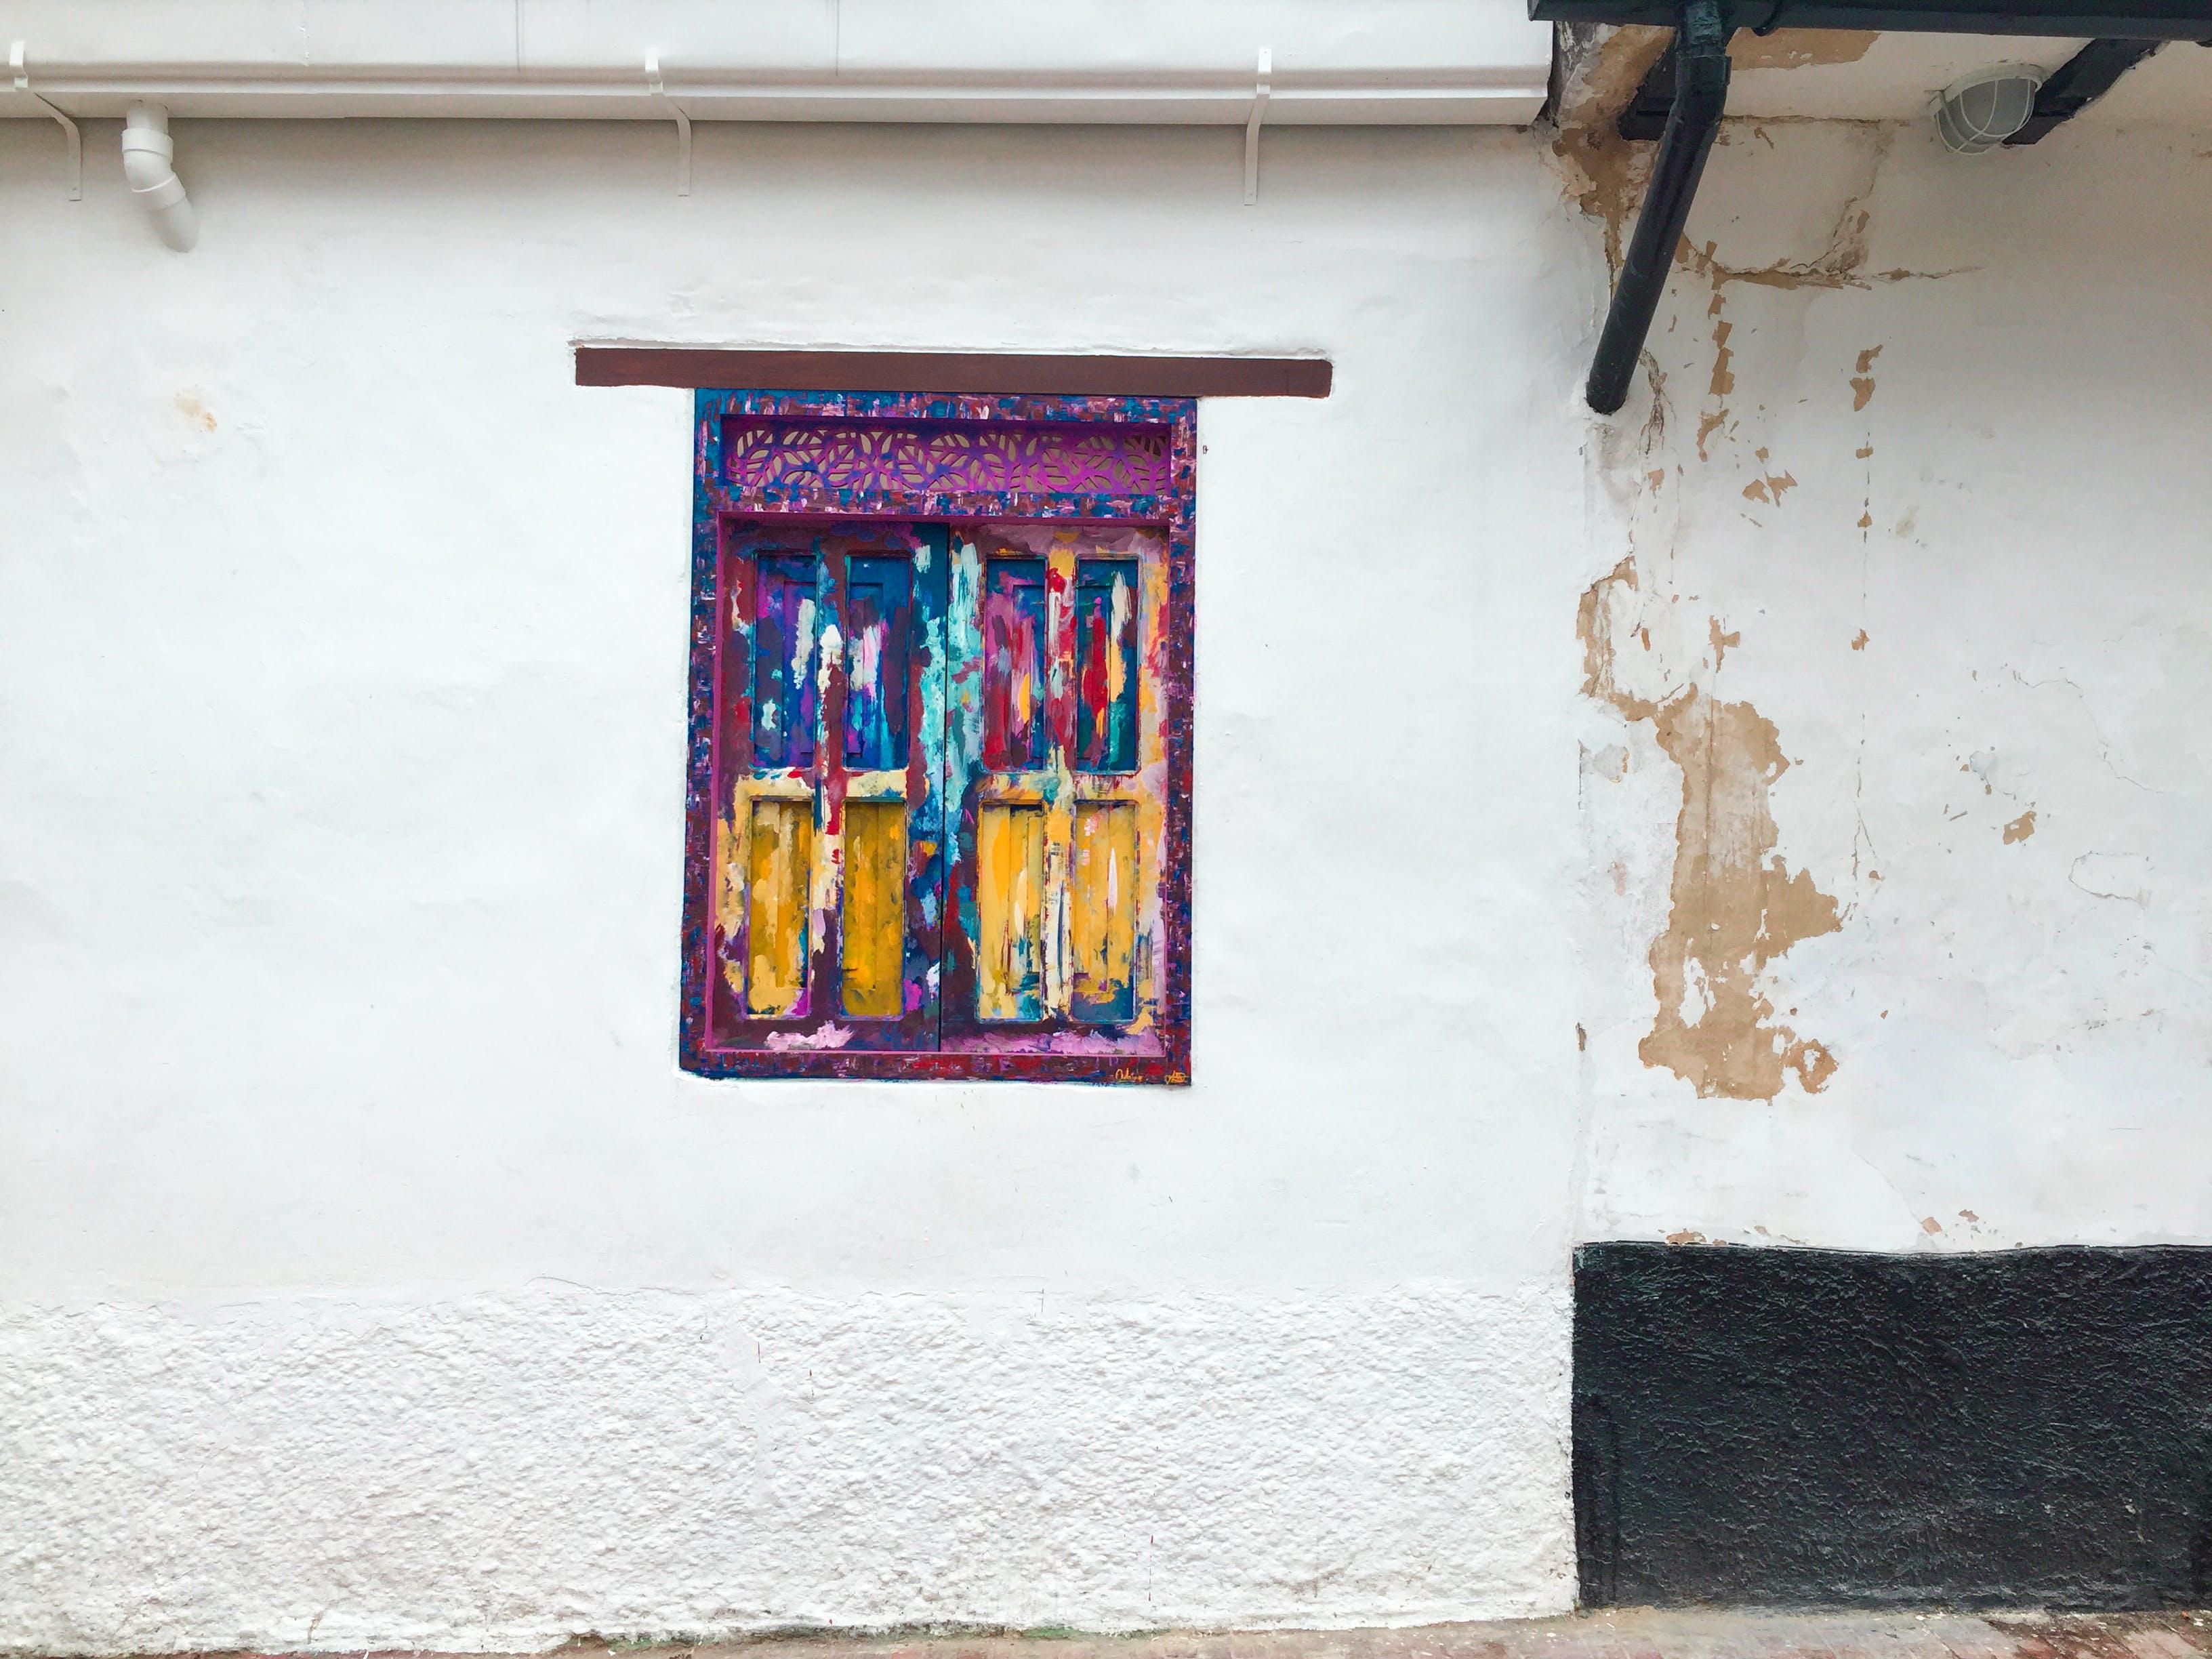 Closed Multicolored Wooden Window